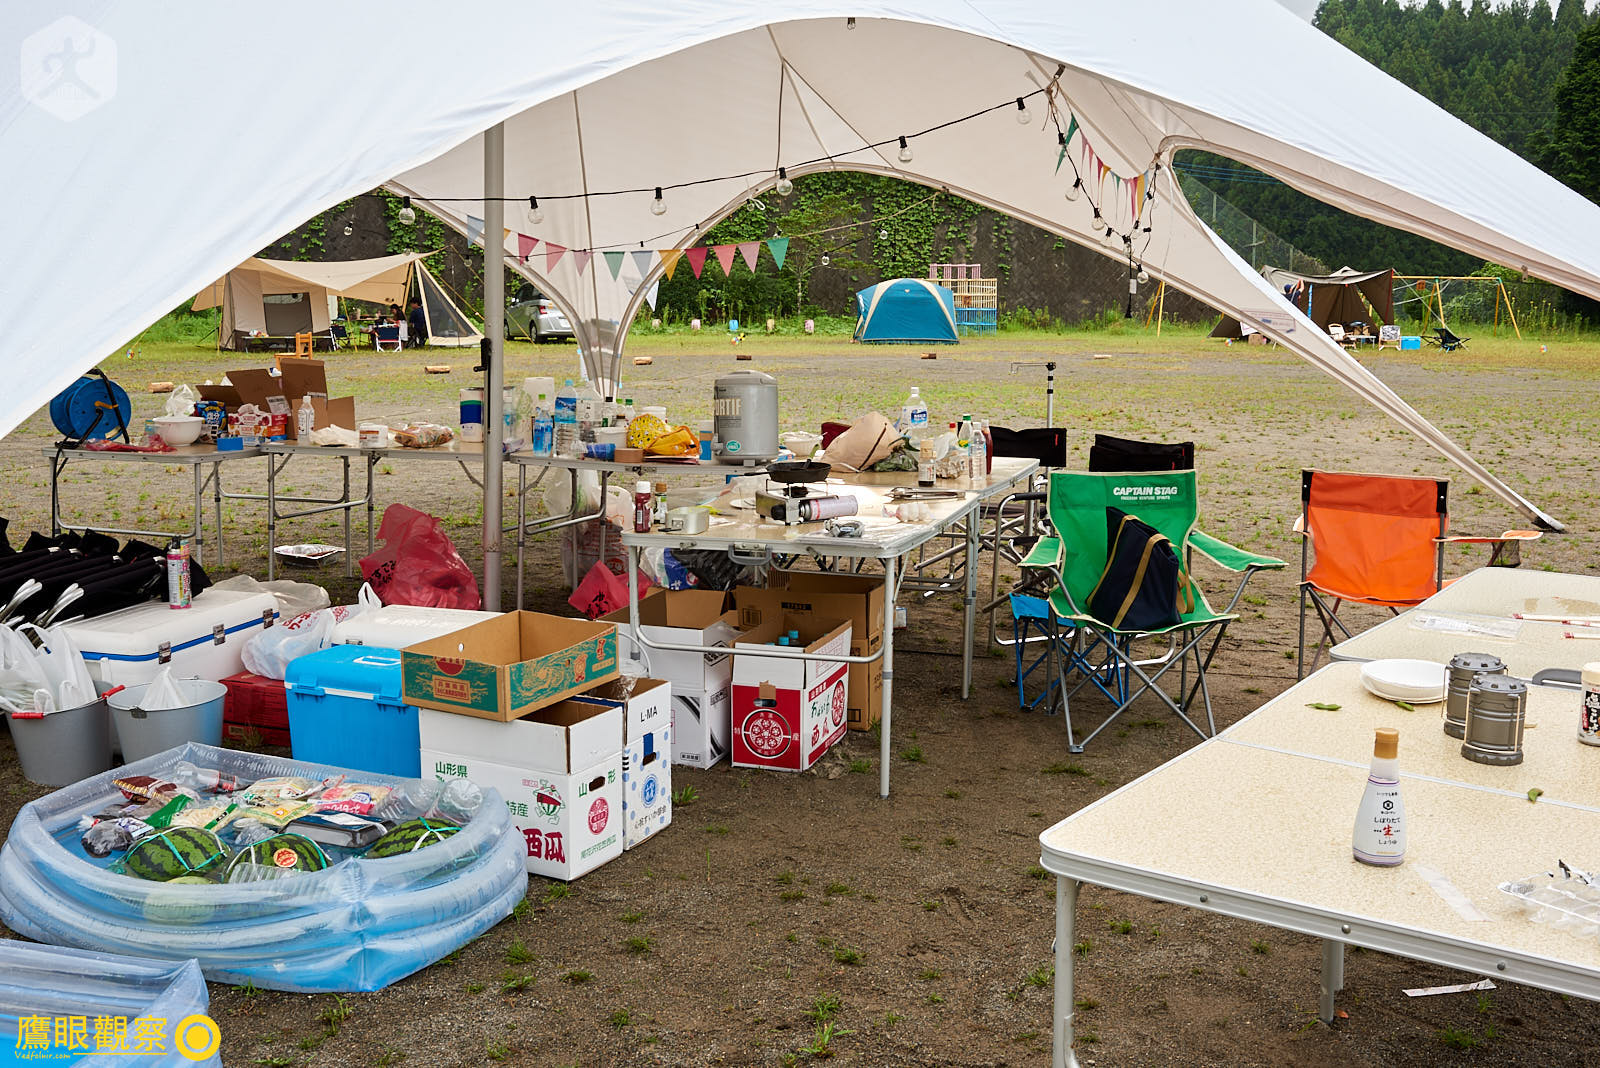 Japan Travel RV Camper School 20190818055045 日本廢棄小學 🚗 RV 休旅車露營、森林探險之旅(櫪木縣鹿沼市立久我小學)🇯🇵⛺️